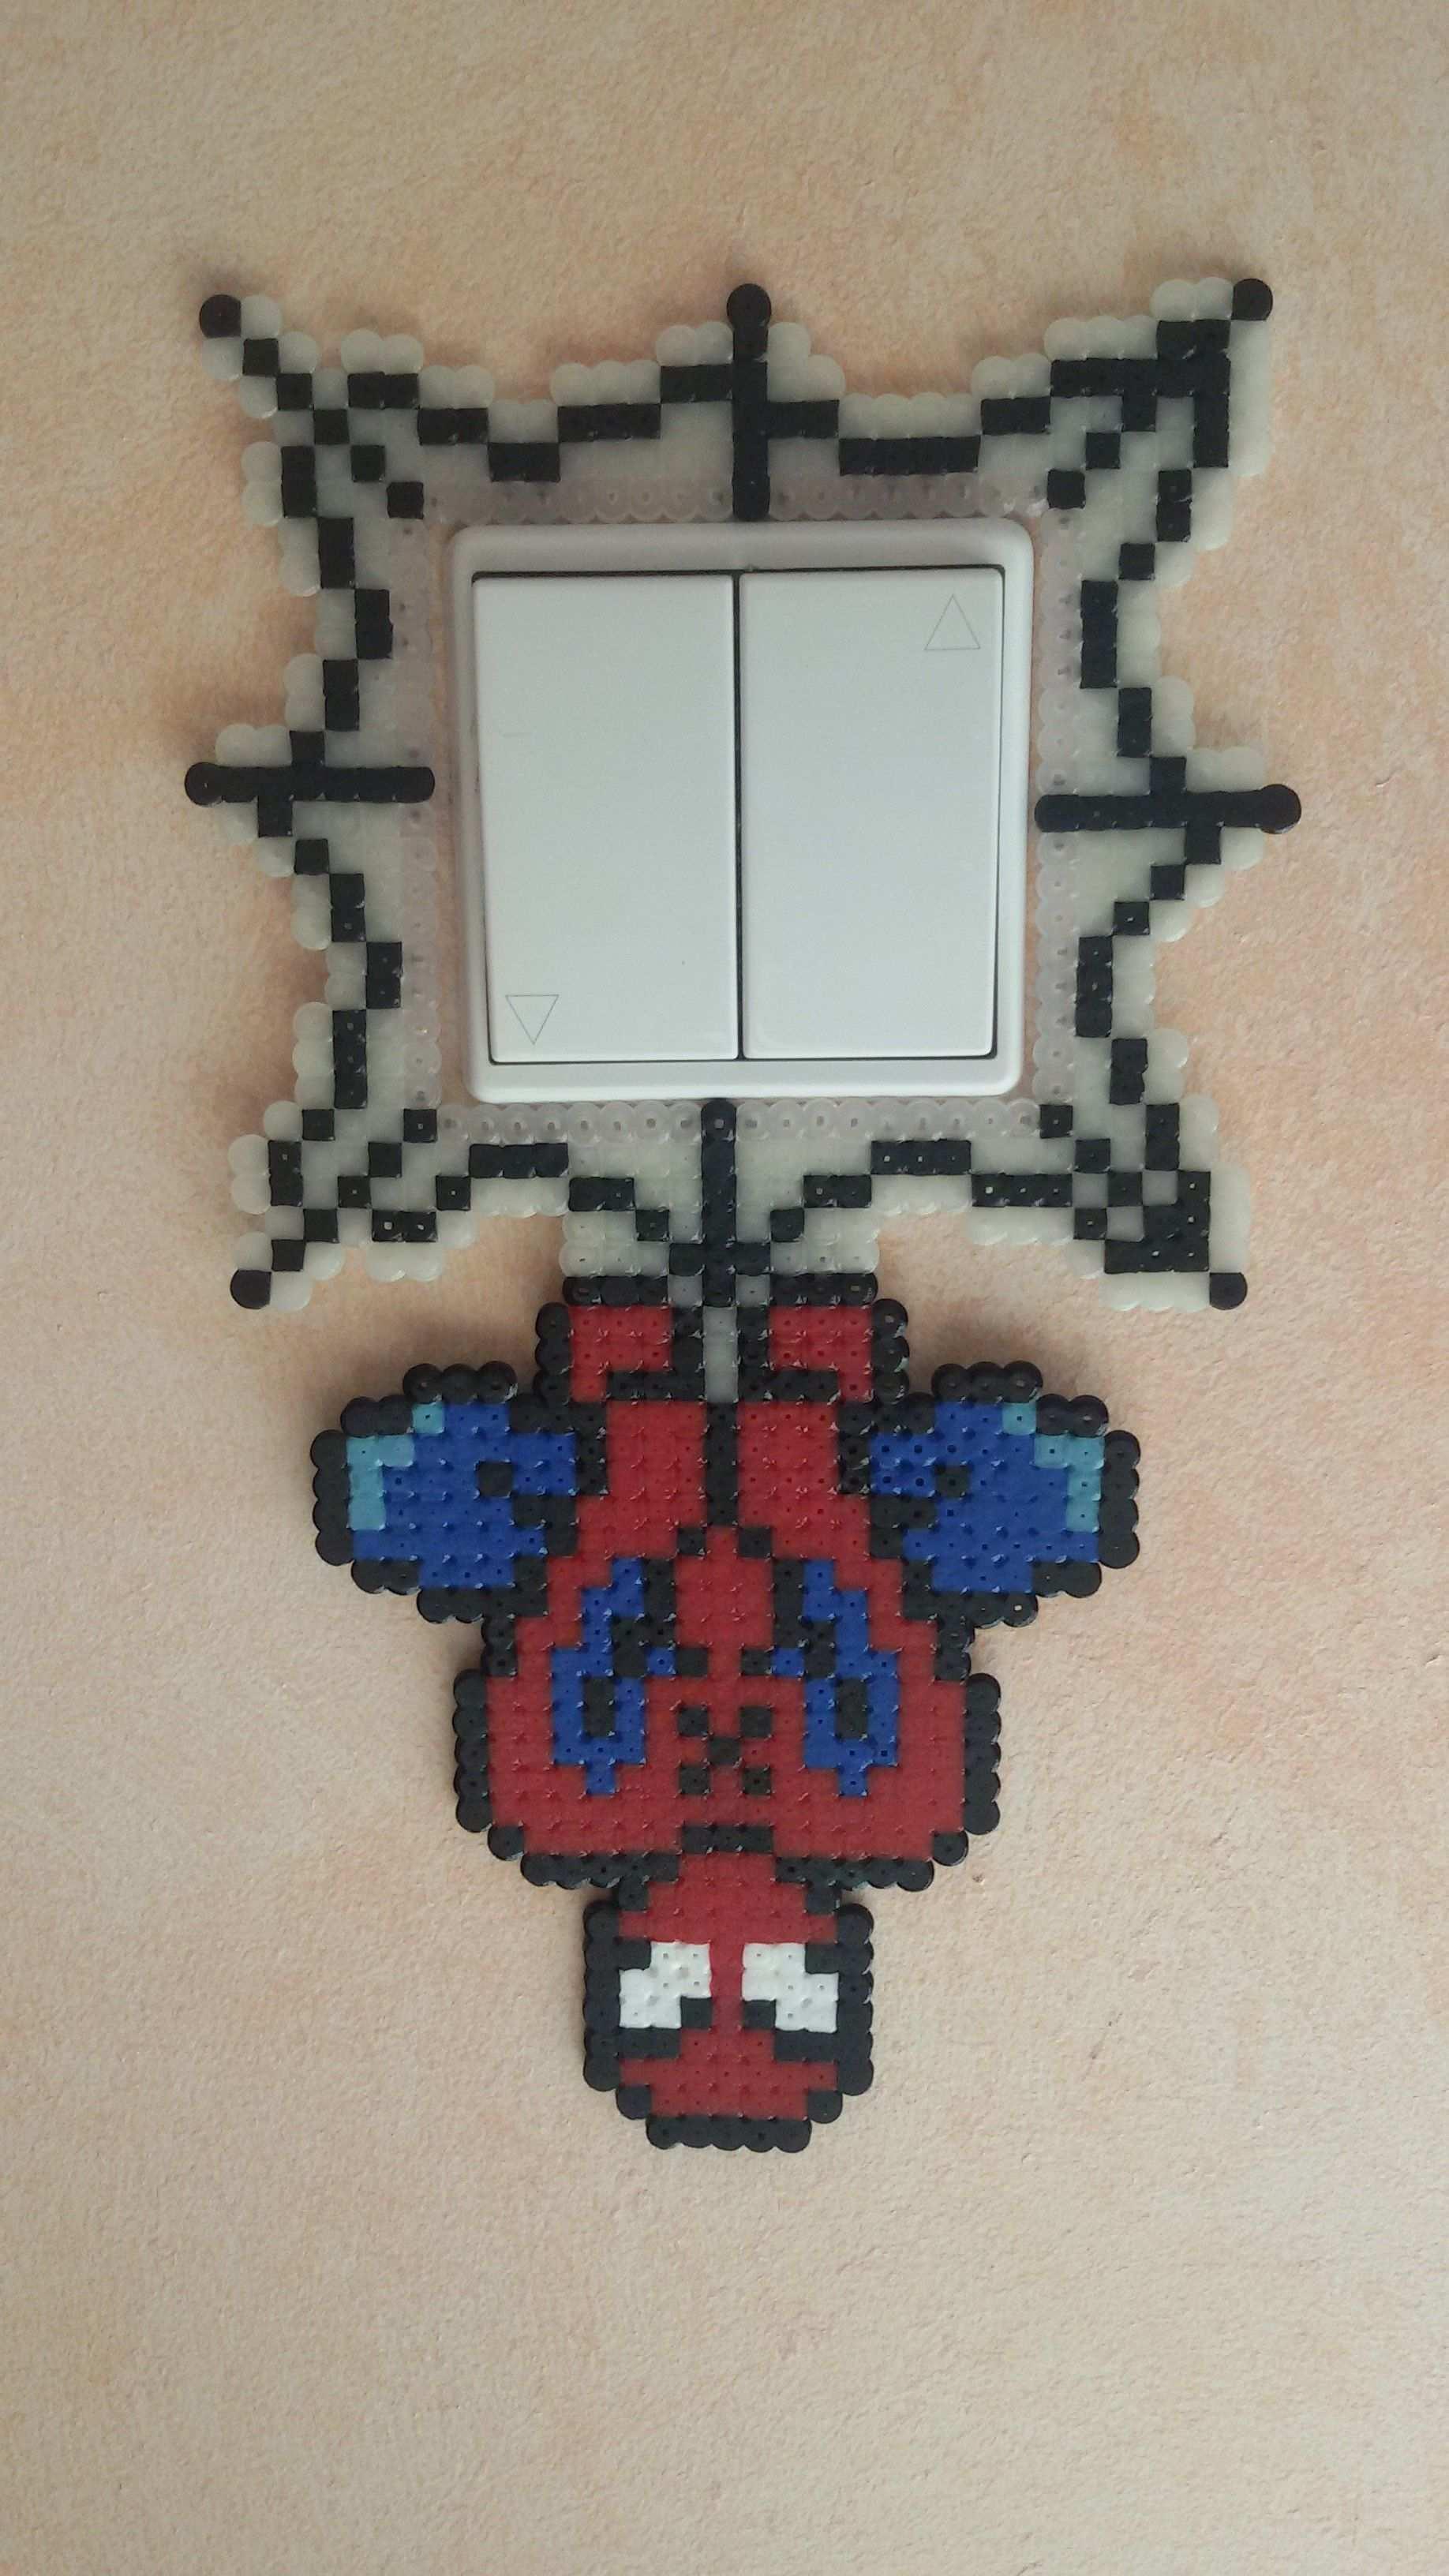 Beads Perler Spiderman Switch By Groslip1255 On Deviantart Perler Bead Art Diy Perler Beads Hama Beads Patterns